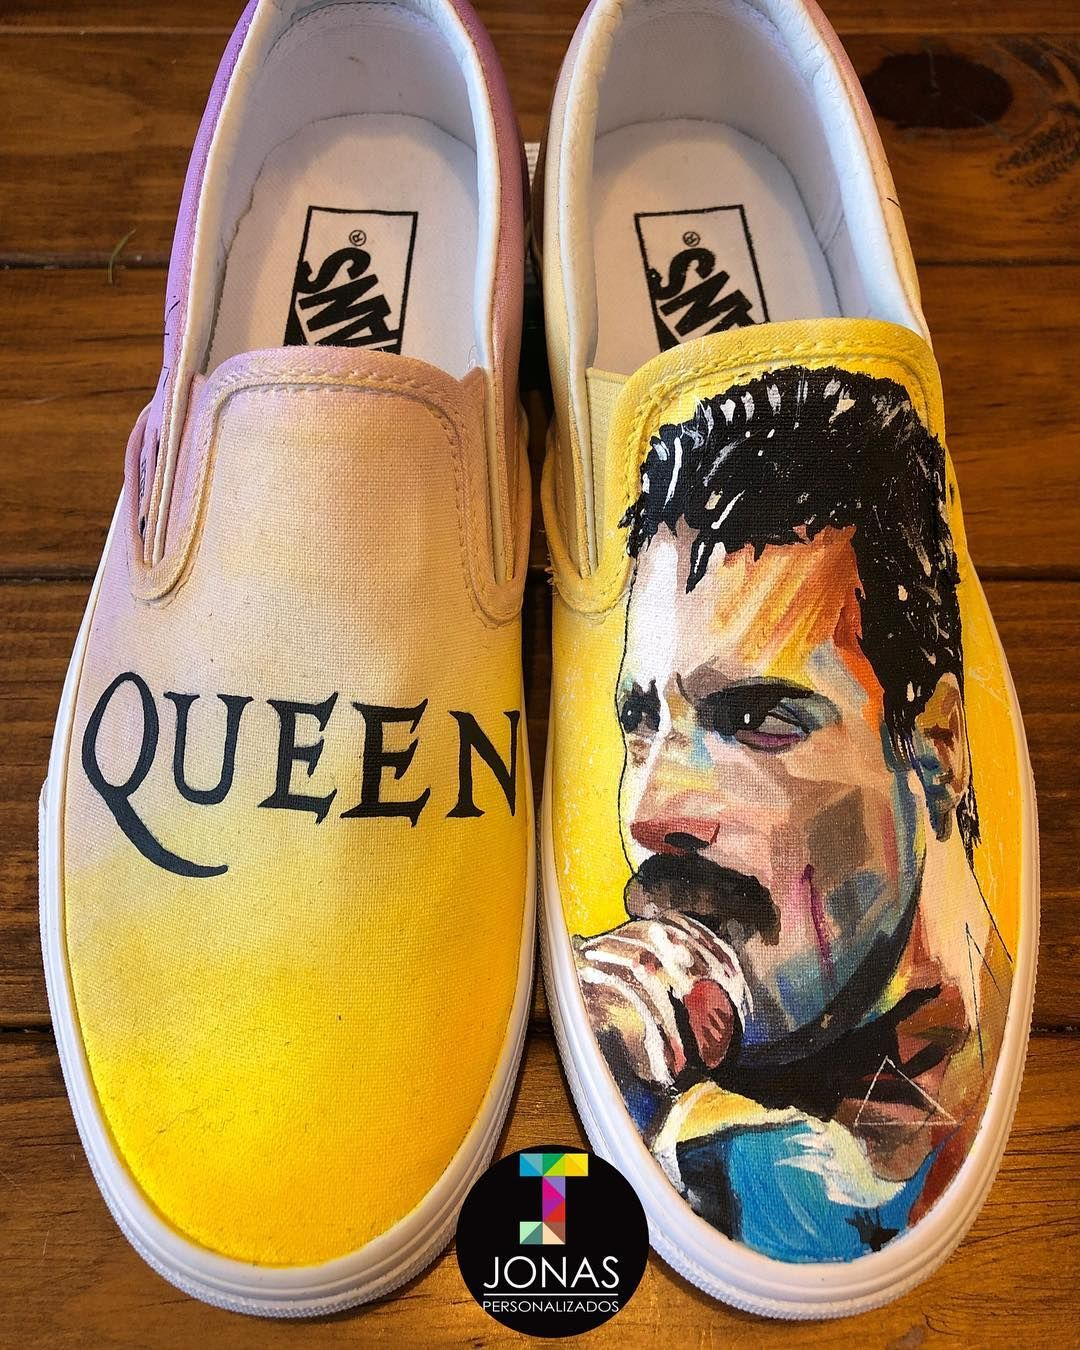 "Tenis y Gorras Pintados a Mano on Instagram: ""Freddie Mercury / whatsapp 5510081710 / 100% pintados a mano / @officialqueenmusic @freddiemercuryclub @freddie__mercury @mercury_motg…"" #freddiemercury"